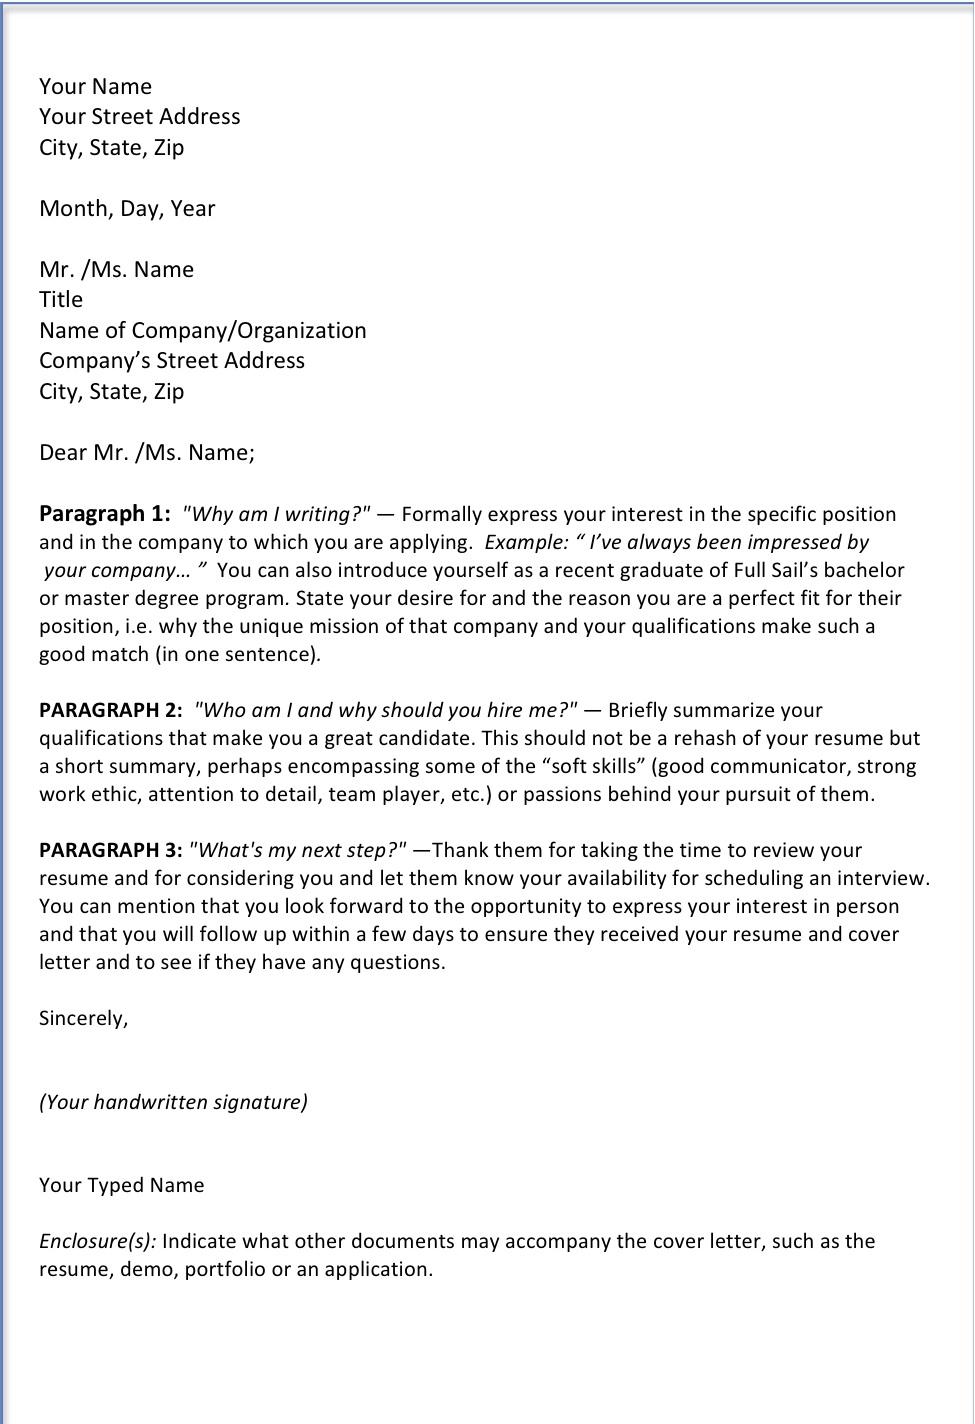 cover letters journalism sample customer service resume cover letters journalism sample cover letters 15 job categories careerjimmy cover letter sample journalism animateus